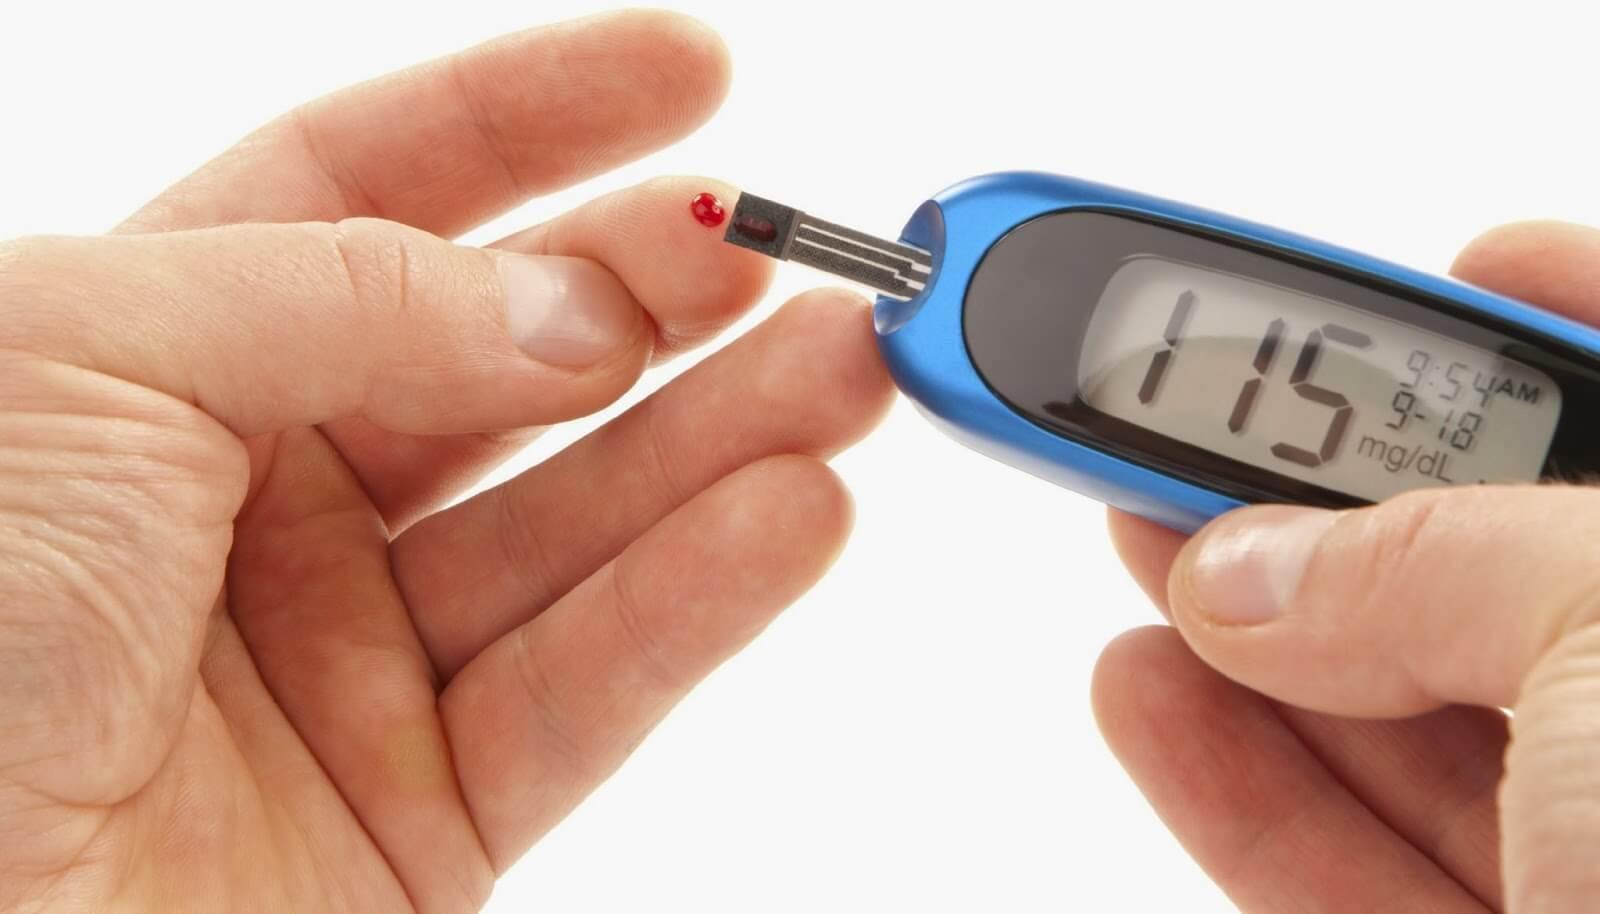 tingkat-gula-penderita-diabetes-naik-20-persen-selama-pandemi